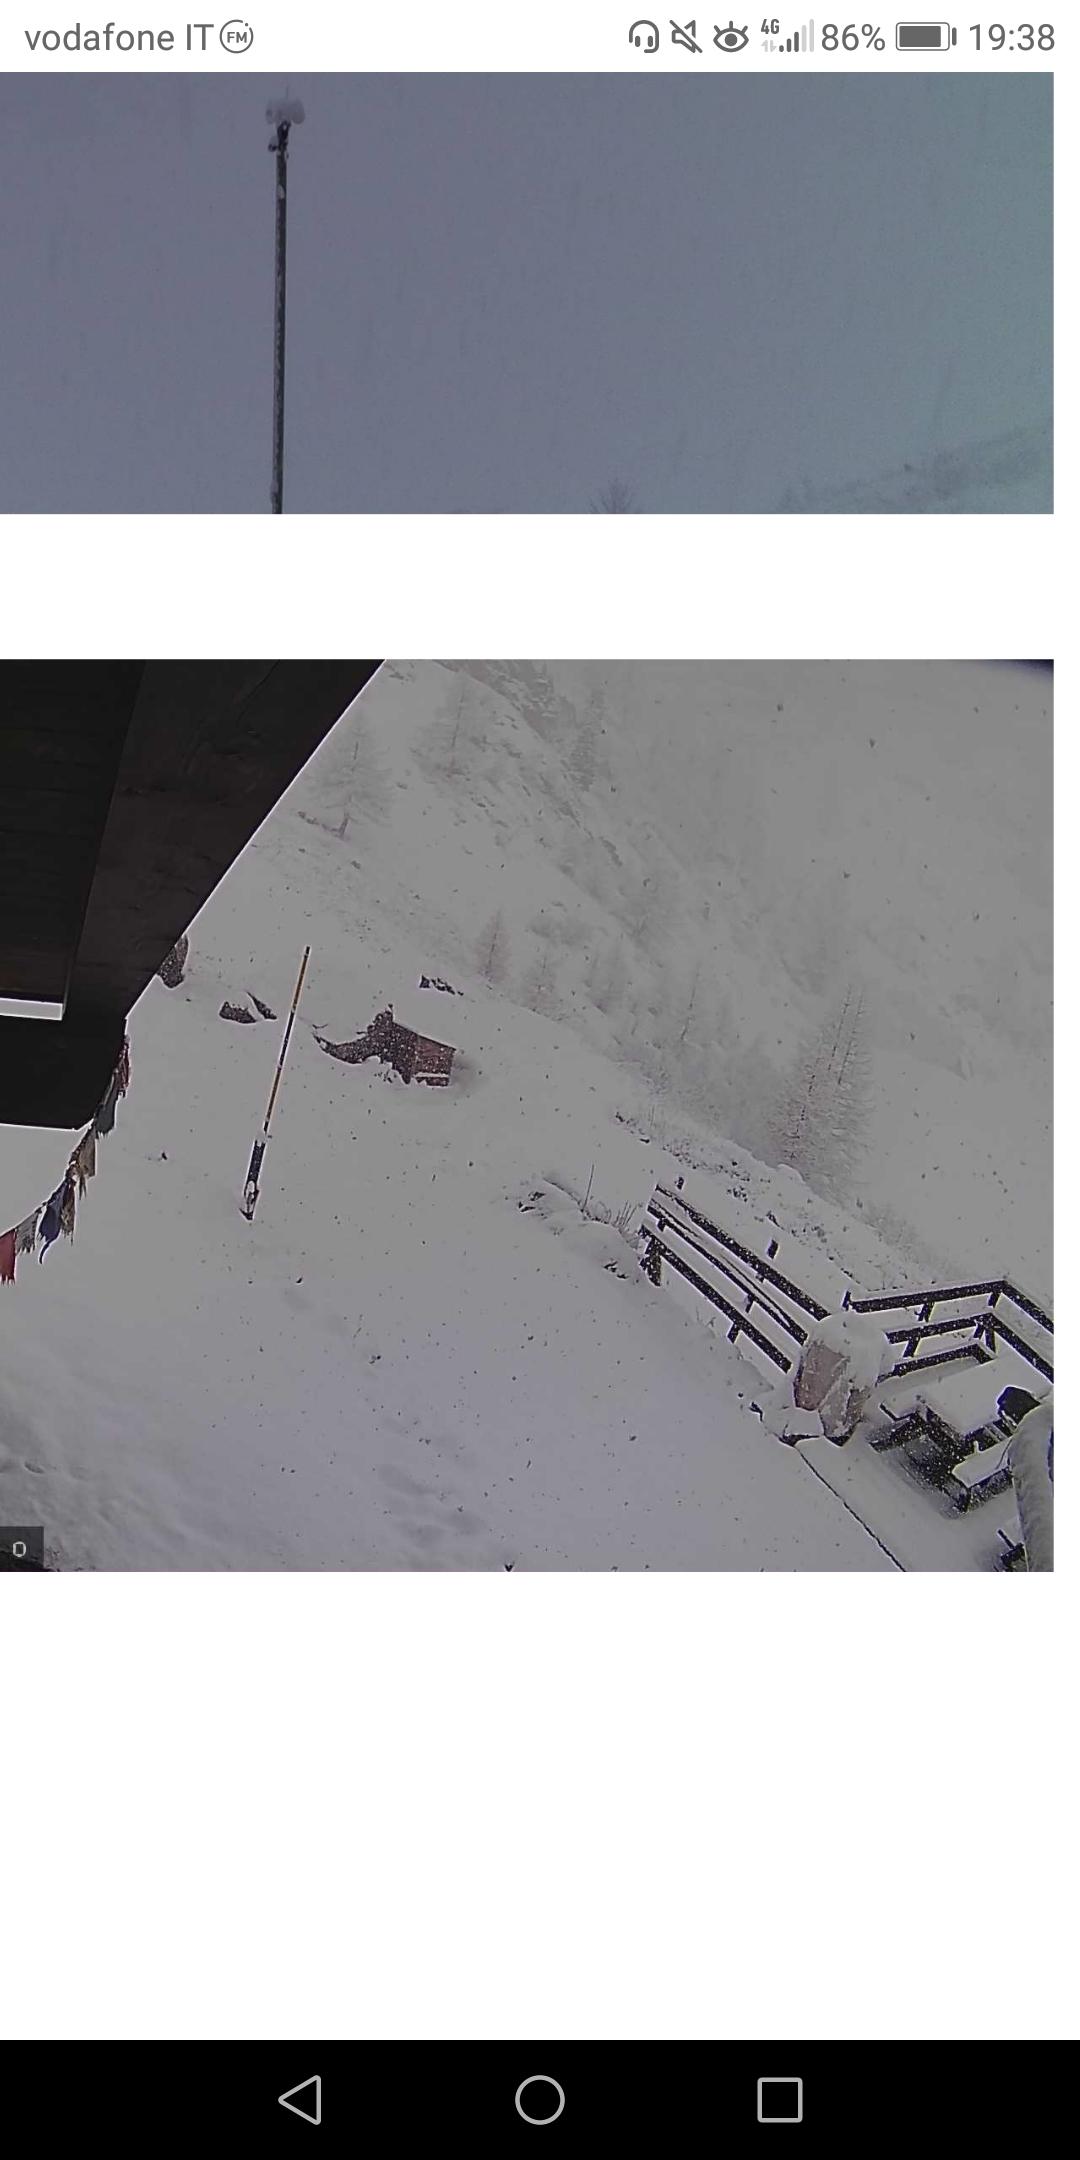 Basso Piemonte Aprile 2019-screenshot_20190403-193852.jpg